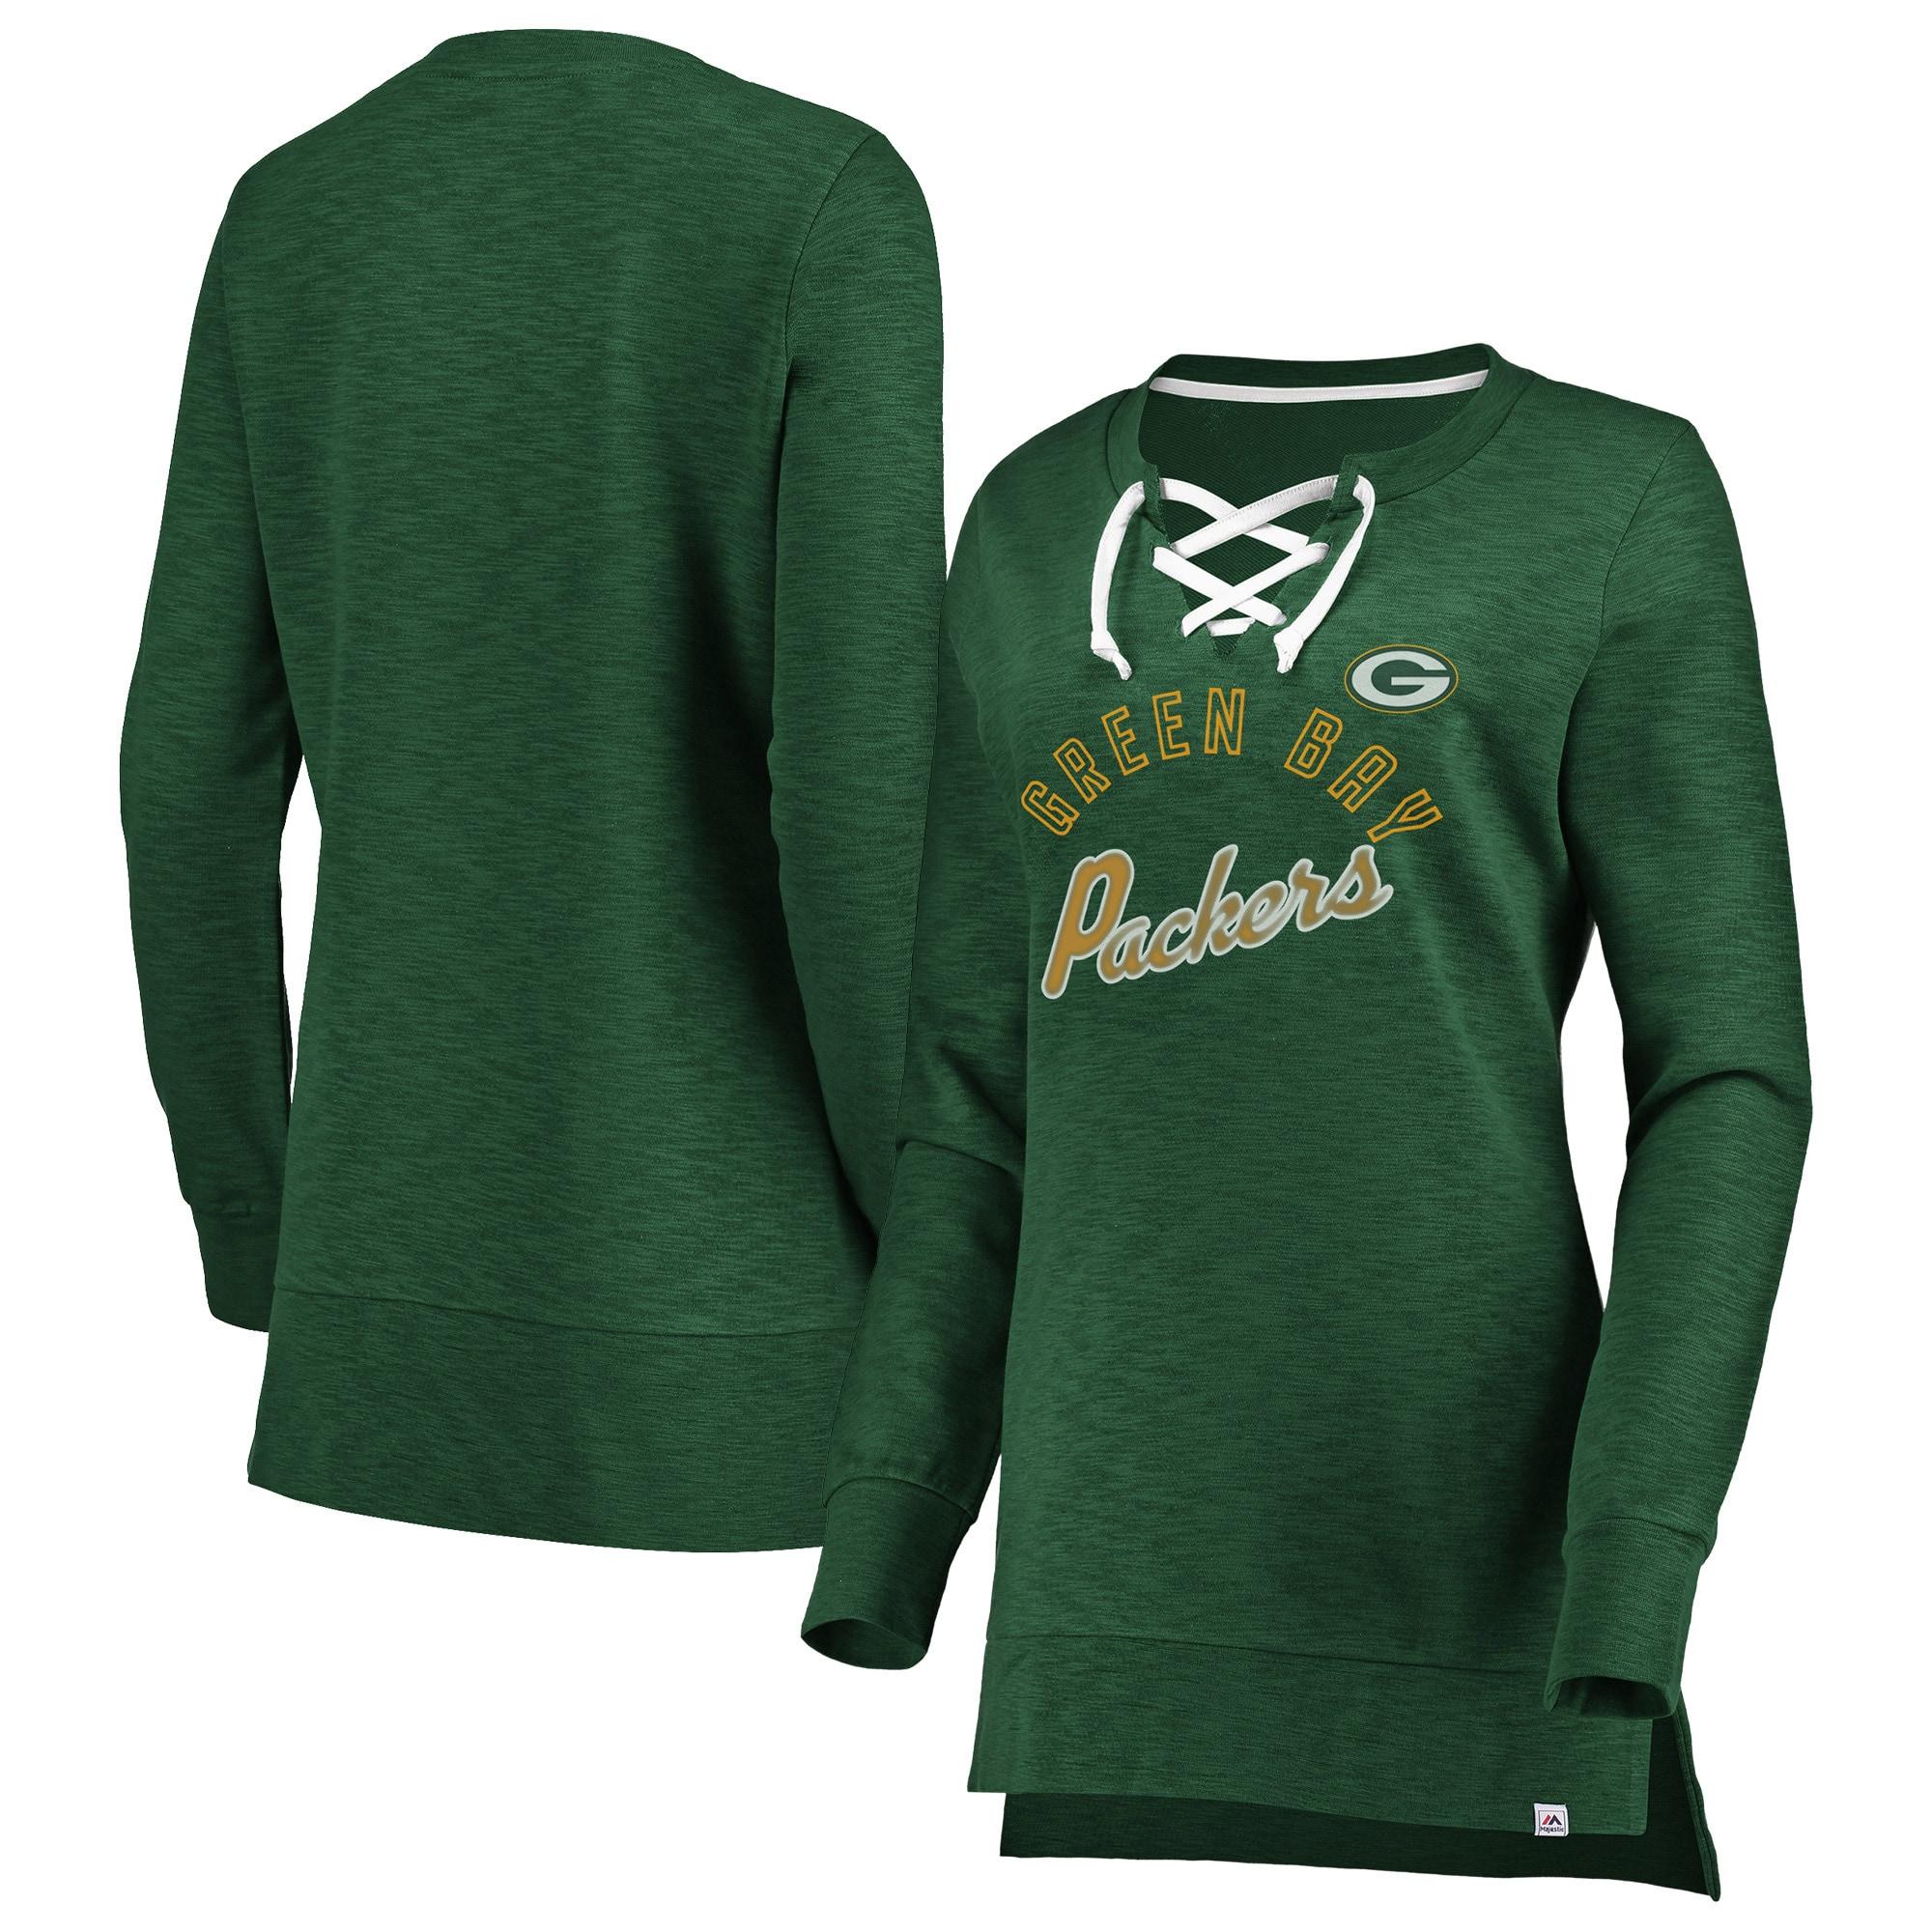 Green Bay Packers Majestic Women's Hyper Lace-Up Tunic Sweatshirt - Green